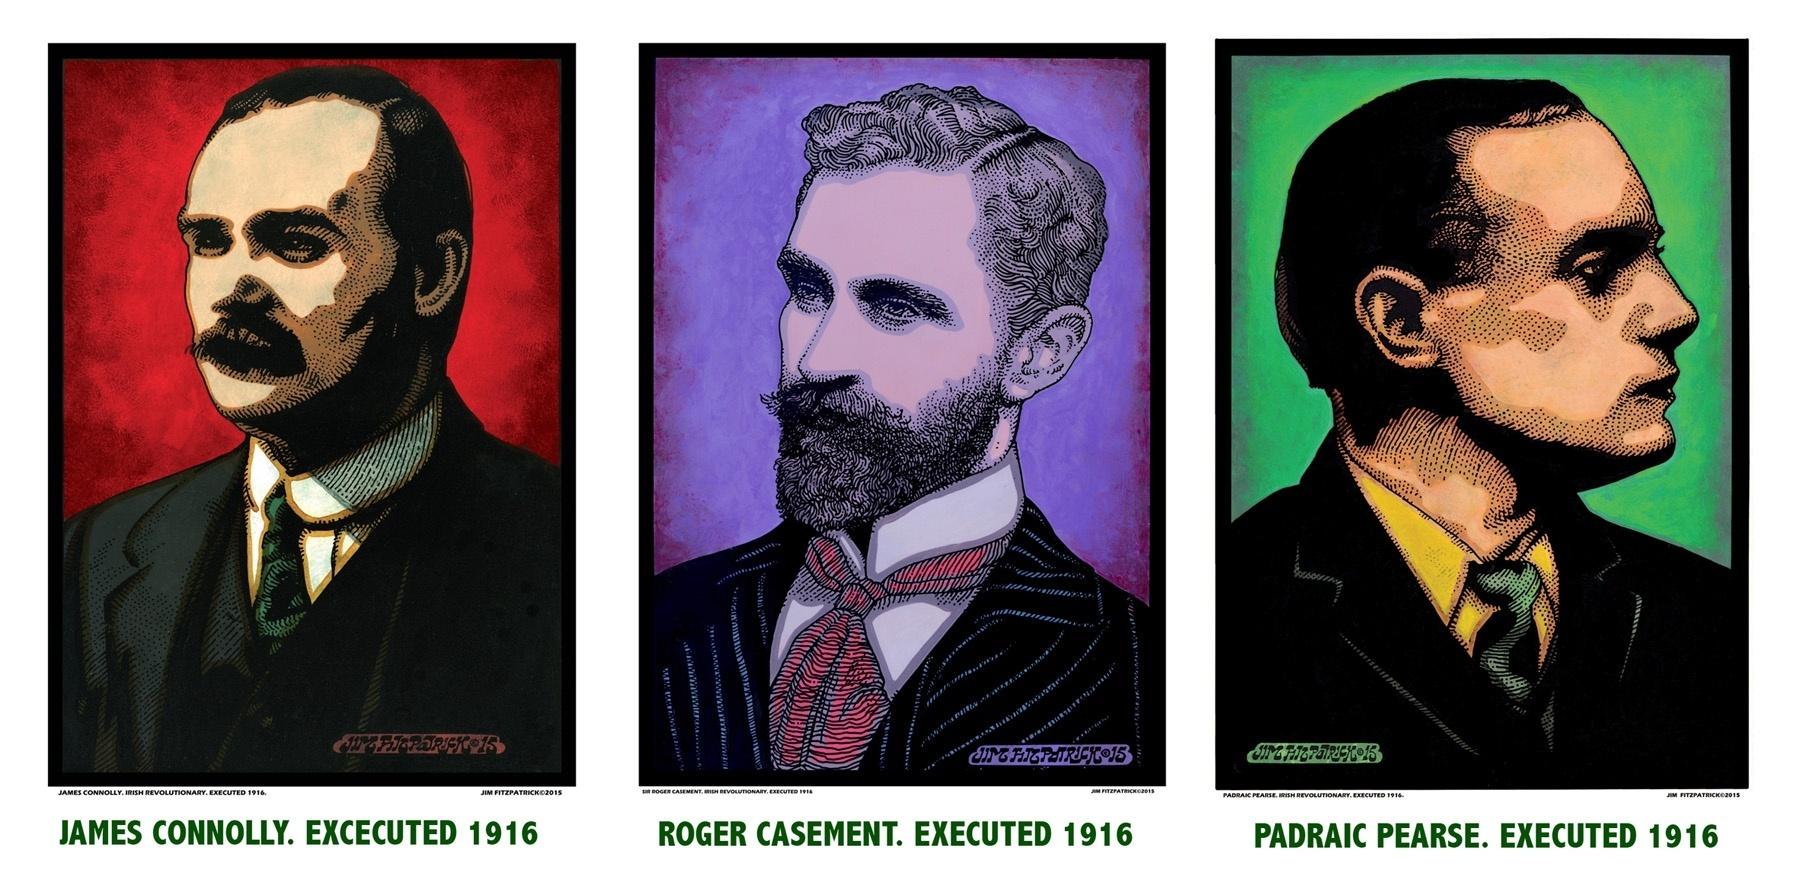 Irish Revolutionaries, Easter 1916, easter Rising 1916, James Connolly, Padraic Pearse, Sir Roger Casement